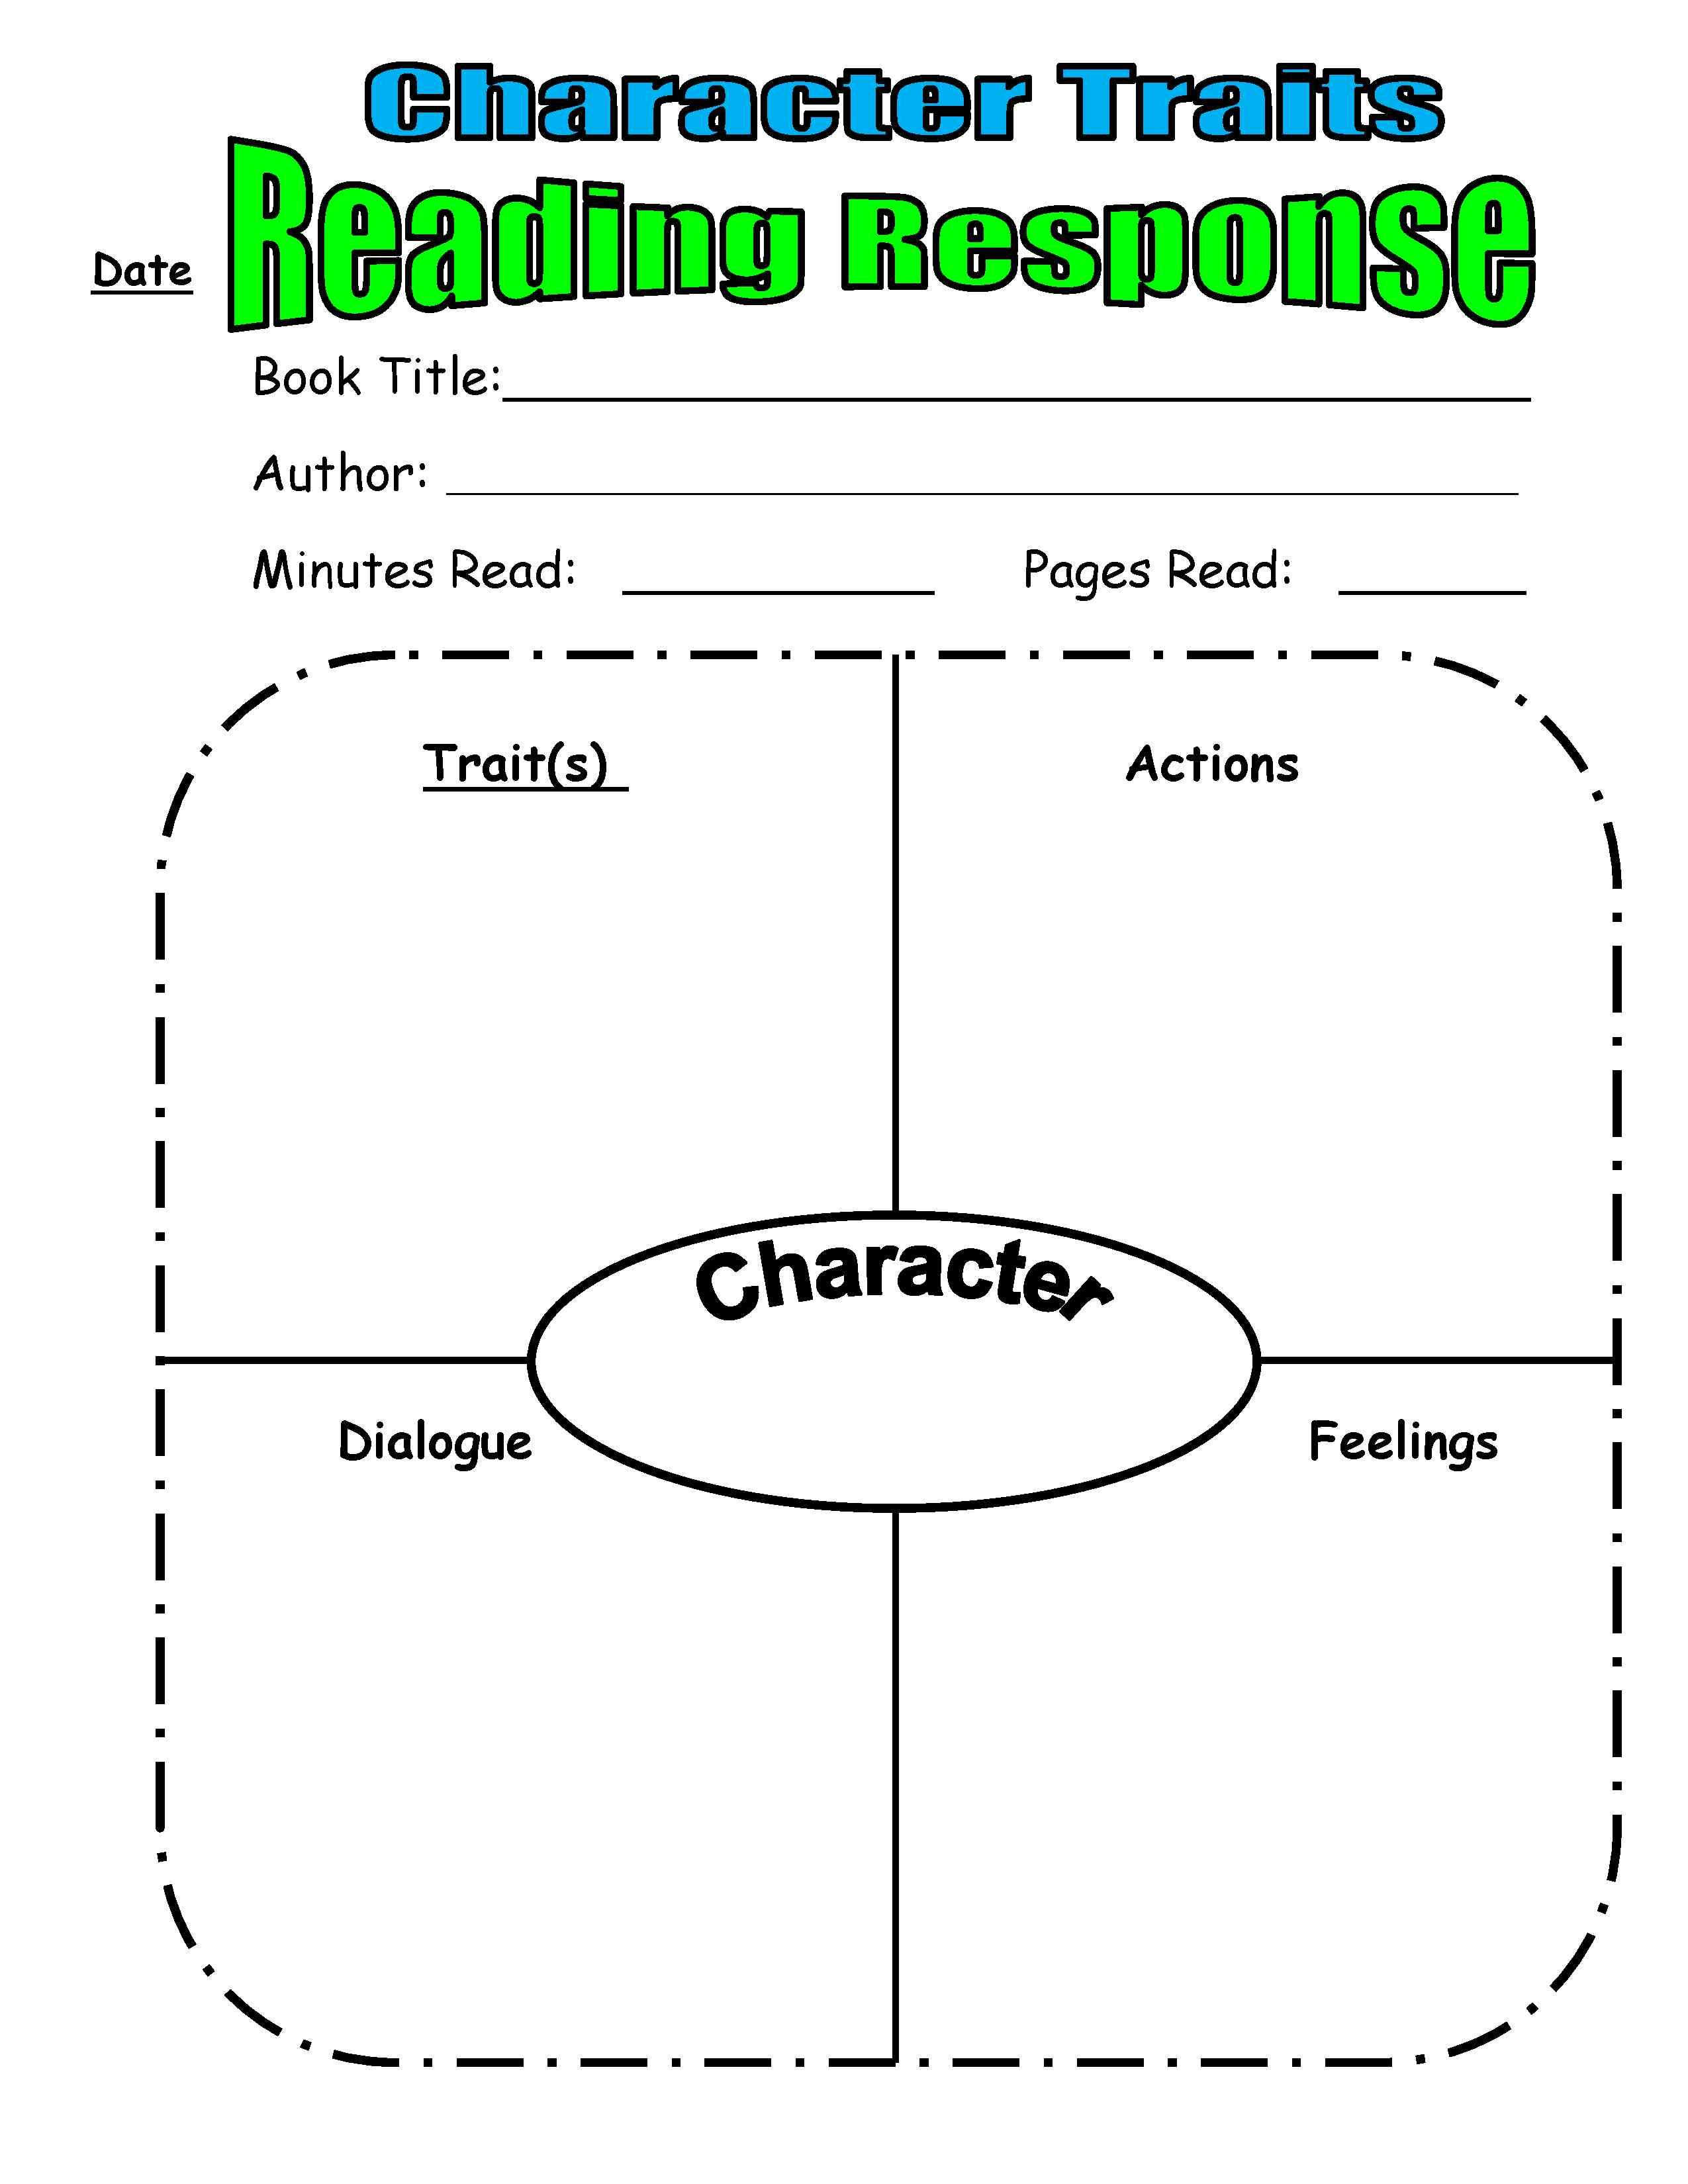 Character Traits Worksheets 3rd Grade - Pichaglobal